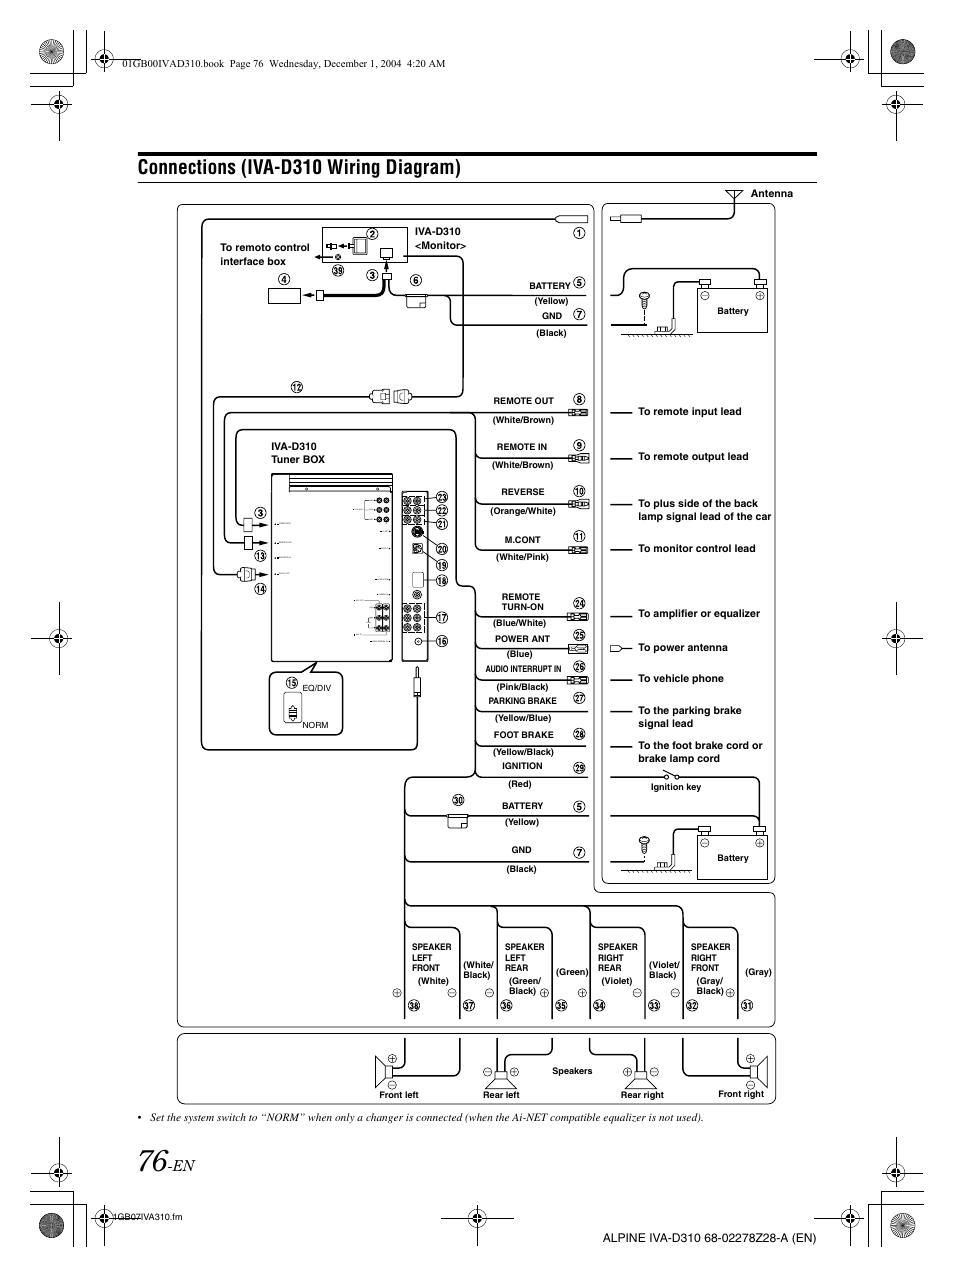 [DIAGRAM_38IS]  Stereo Alpine Diagram Car Wiring B30331070 | Wiring Diagram | Alpine Navigation Wiring Diagram |  | Wiring Diagram - Autoscout24